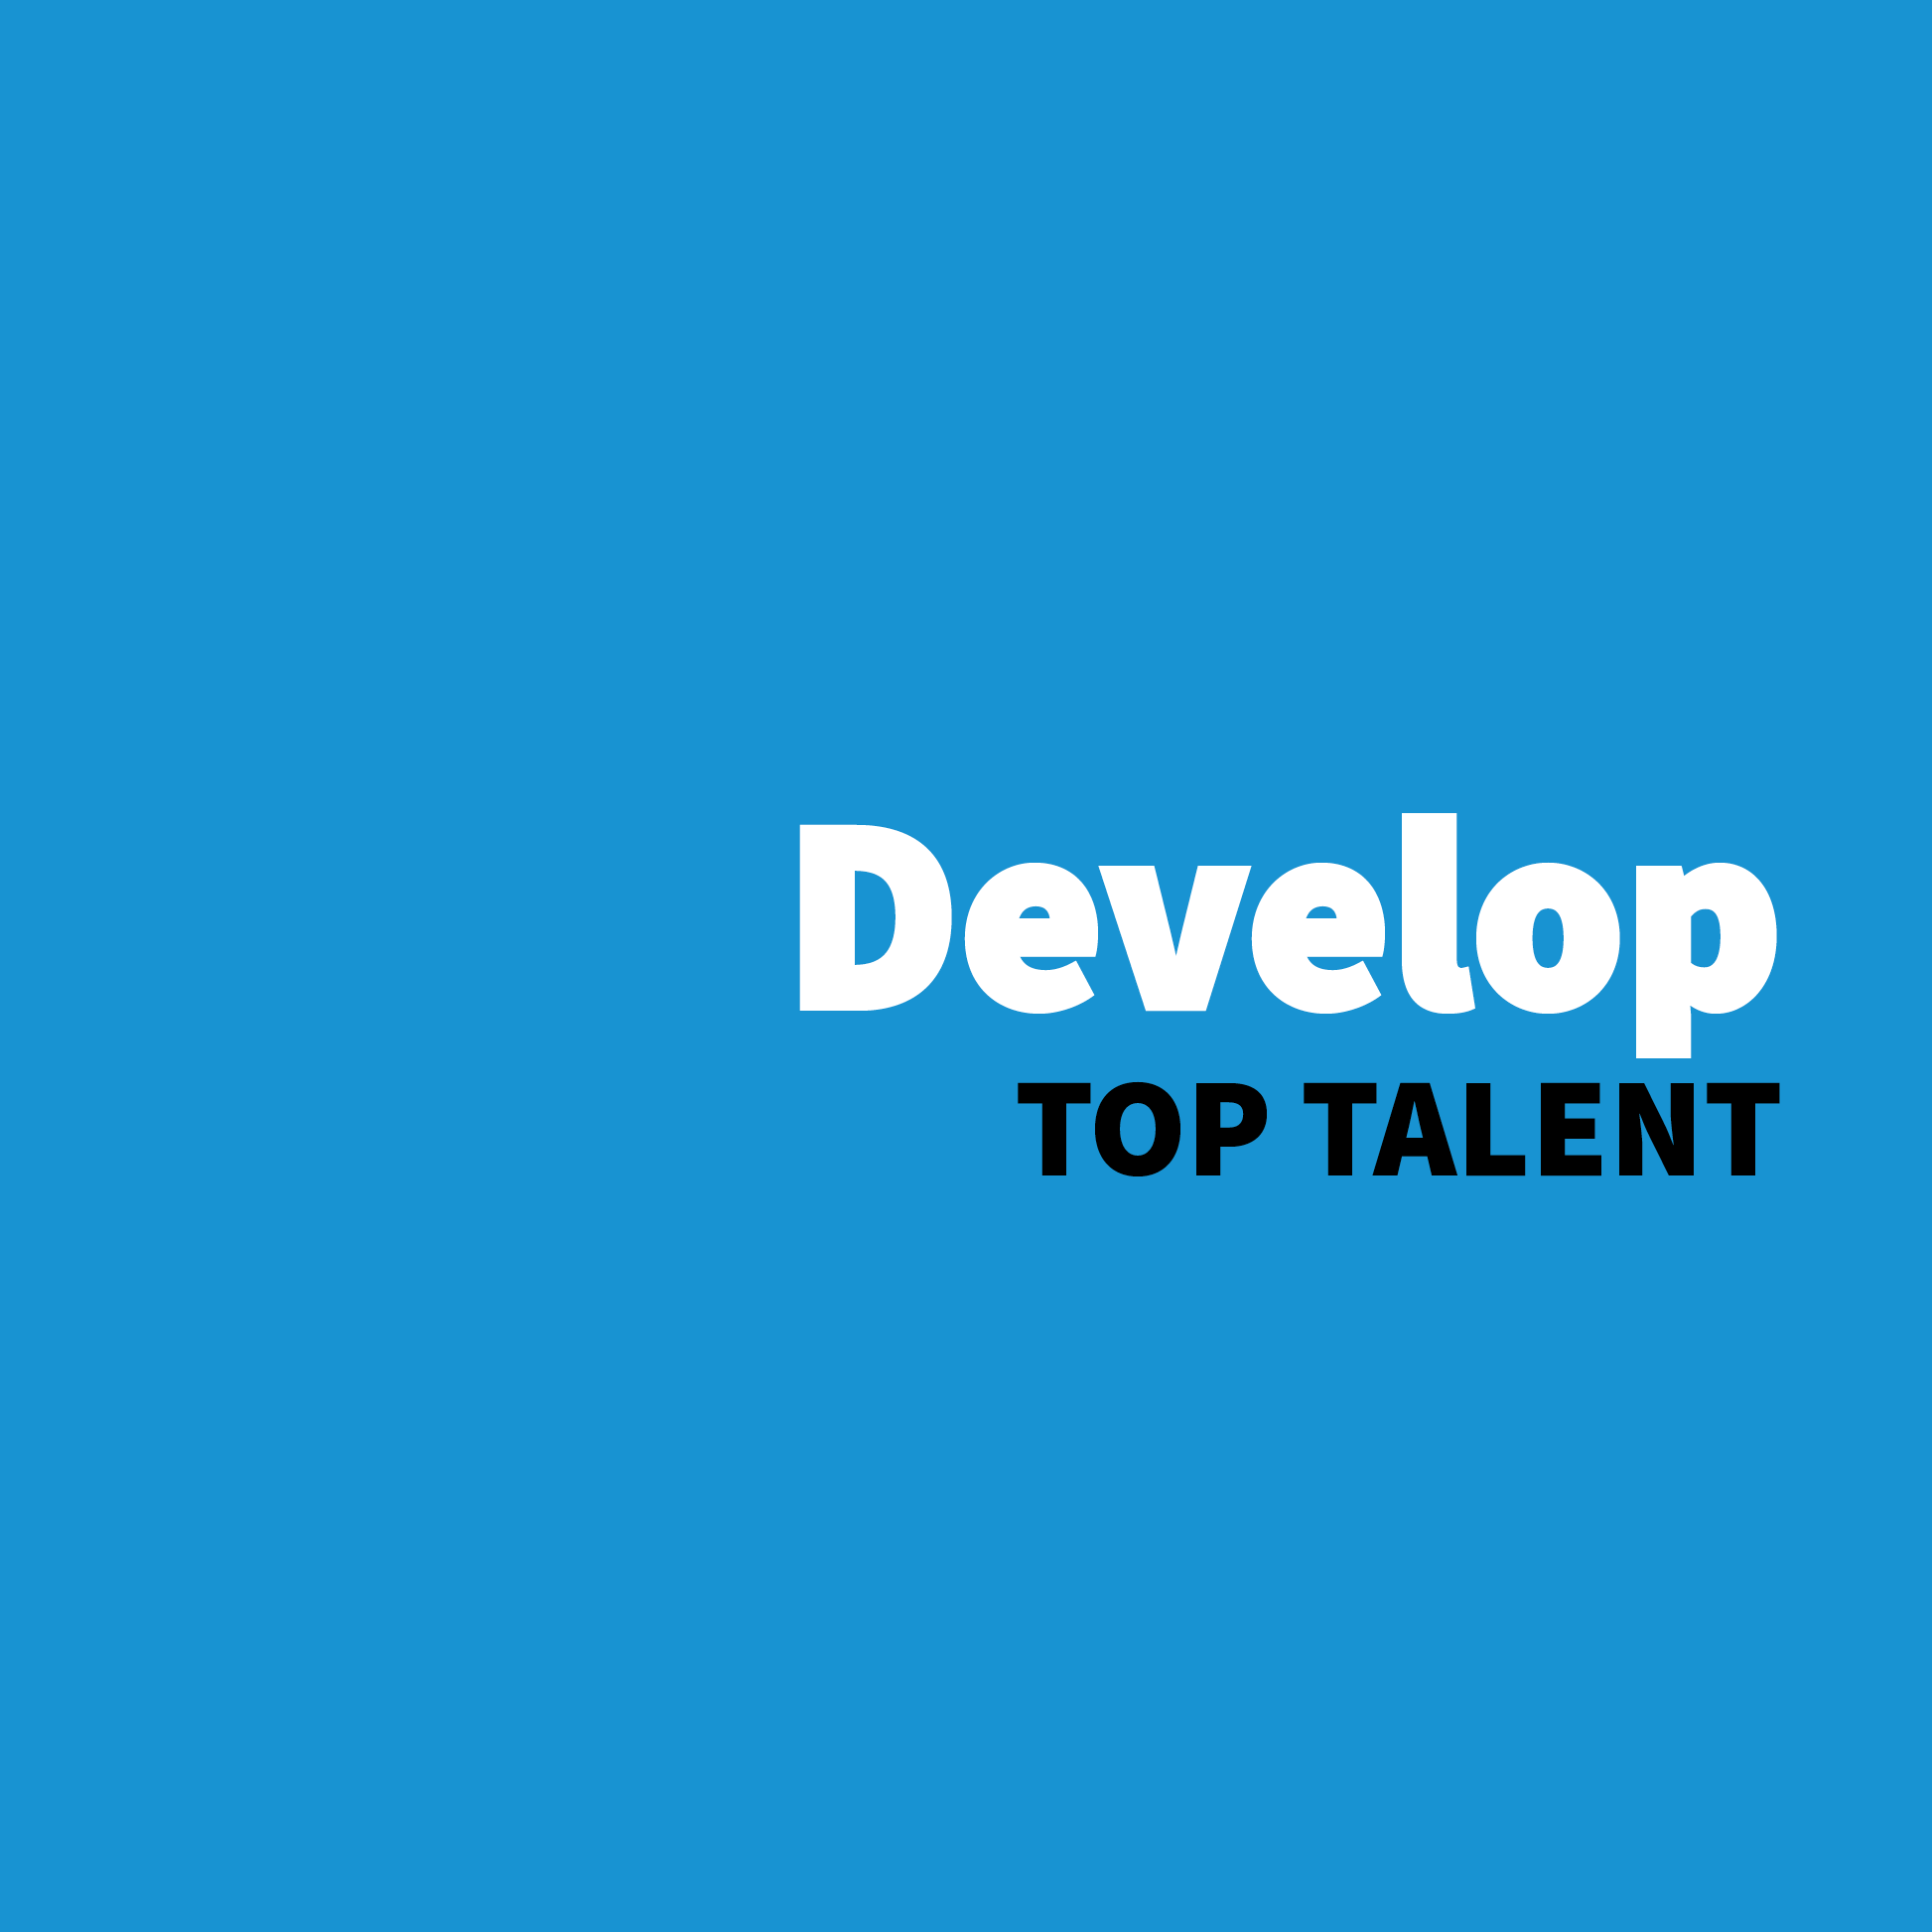 Develop Top Talent